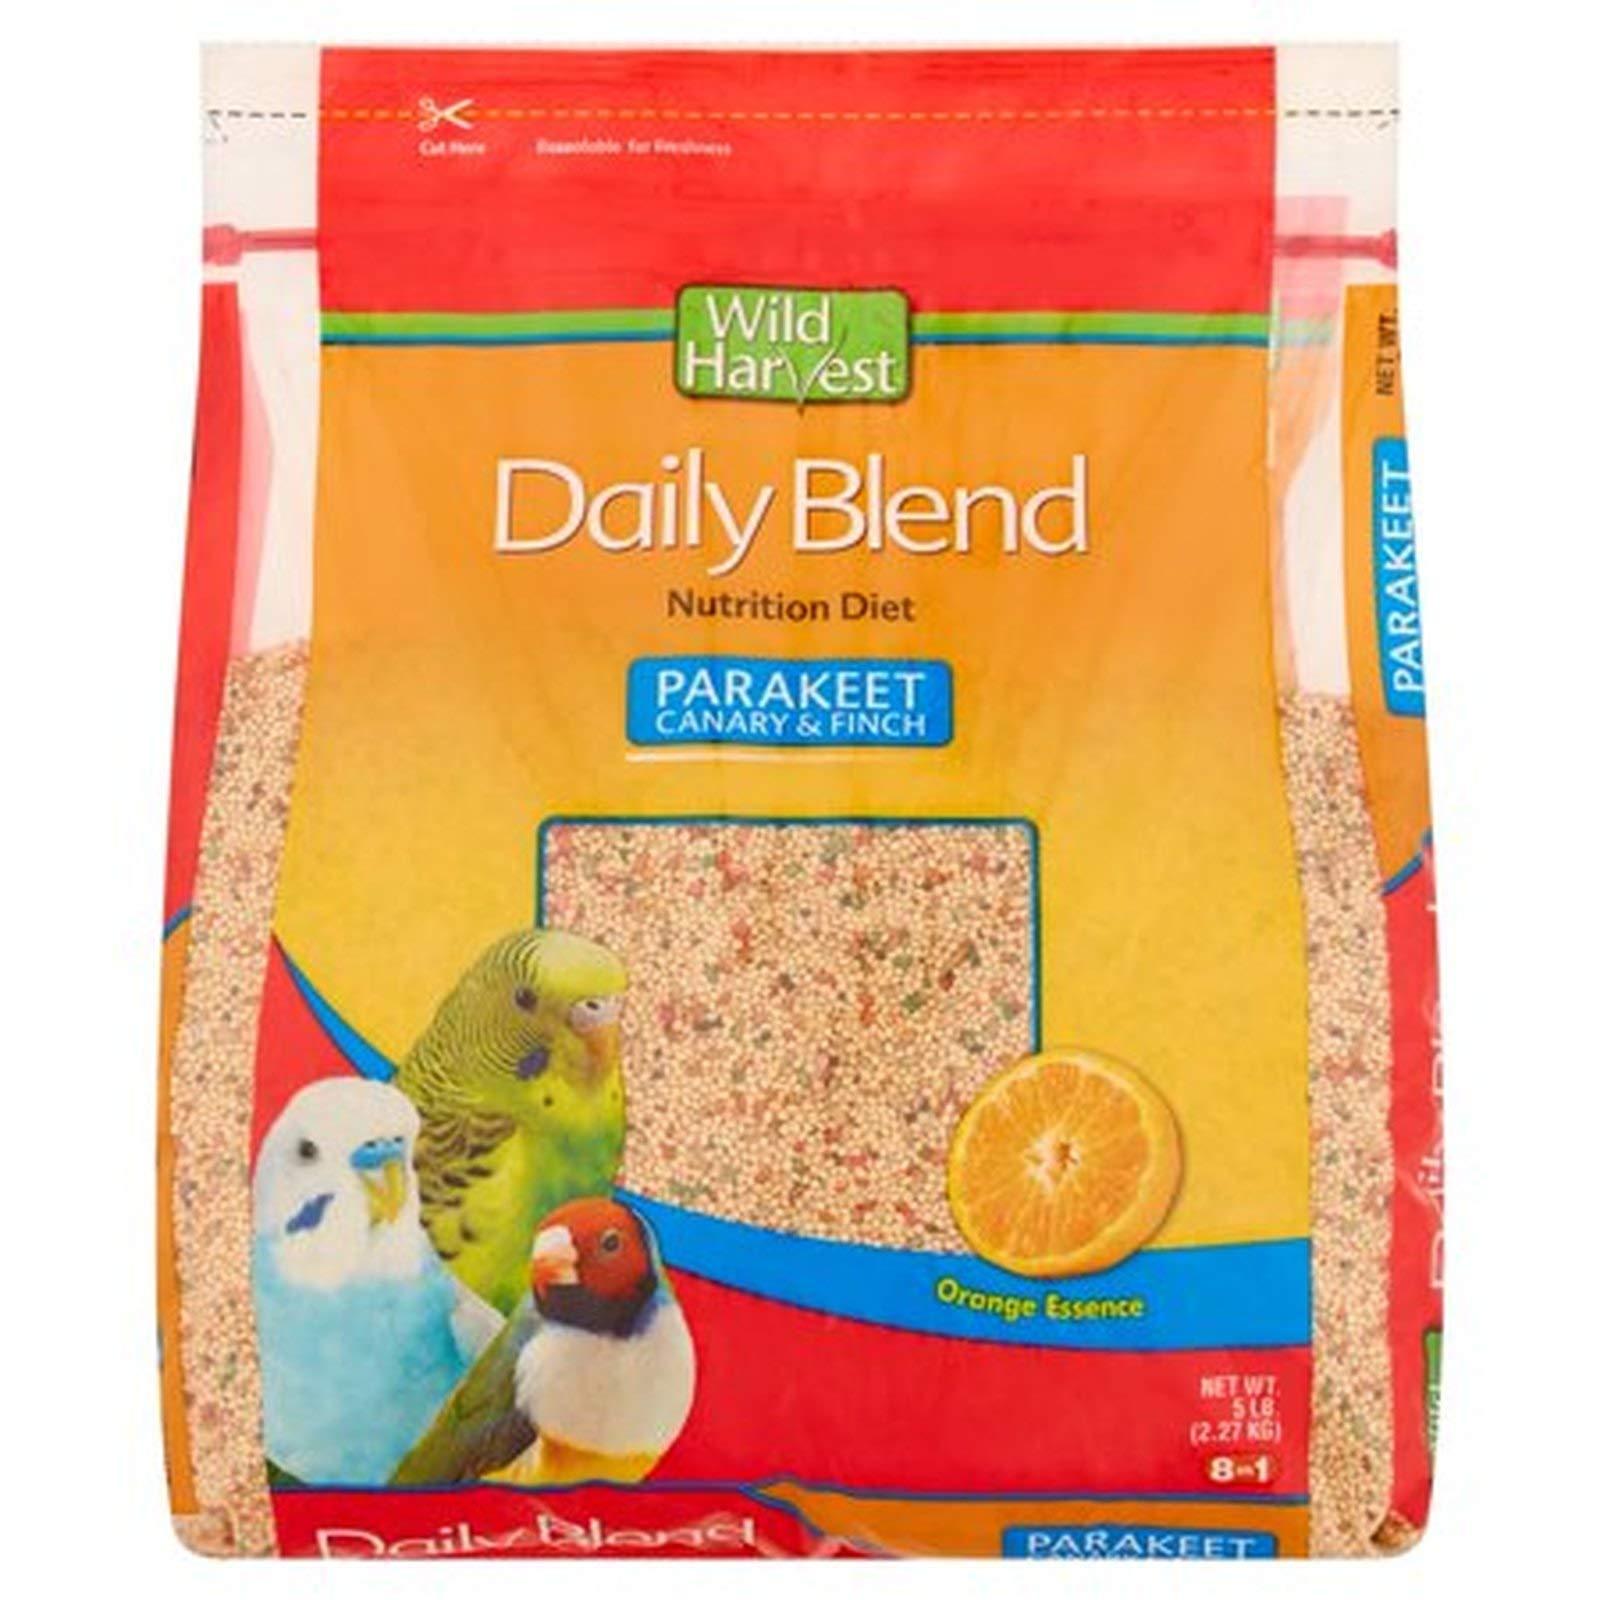 Wild Harvest P-A1907 Wh Daily Blend Parakeet 5# Bag